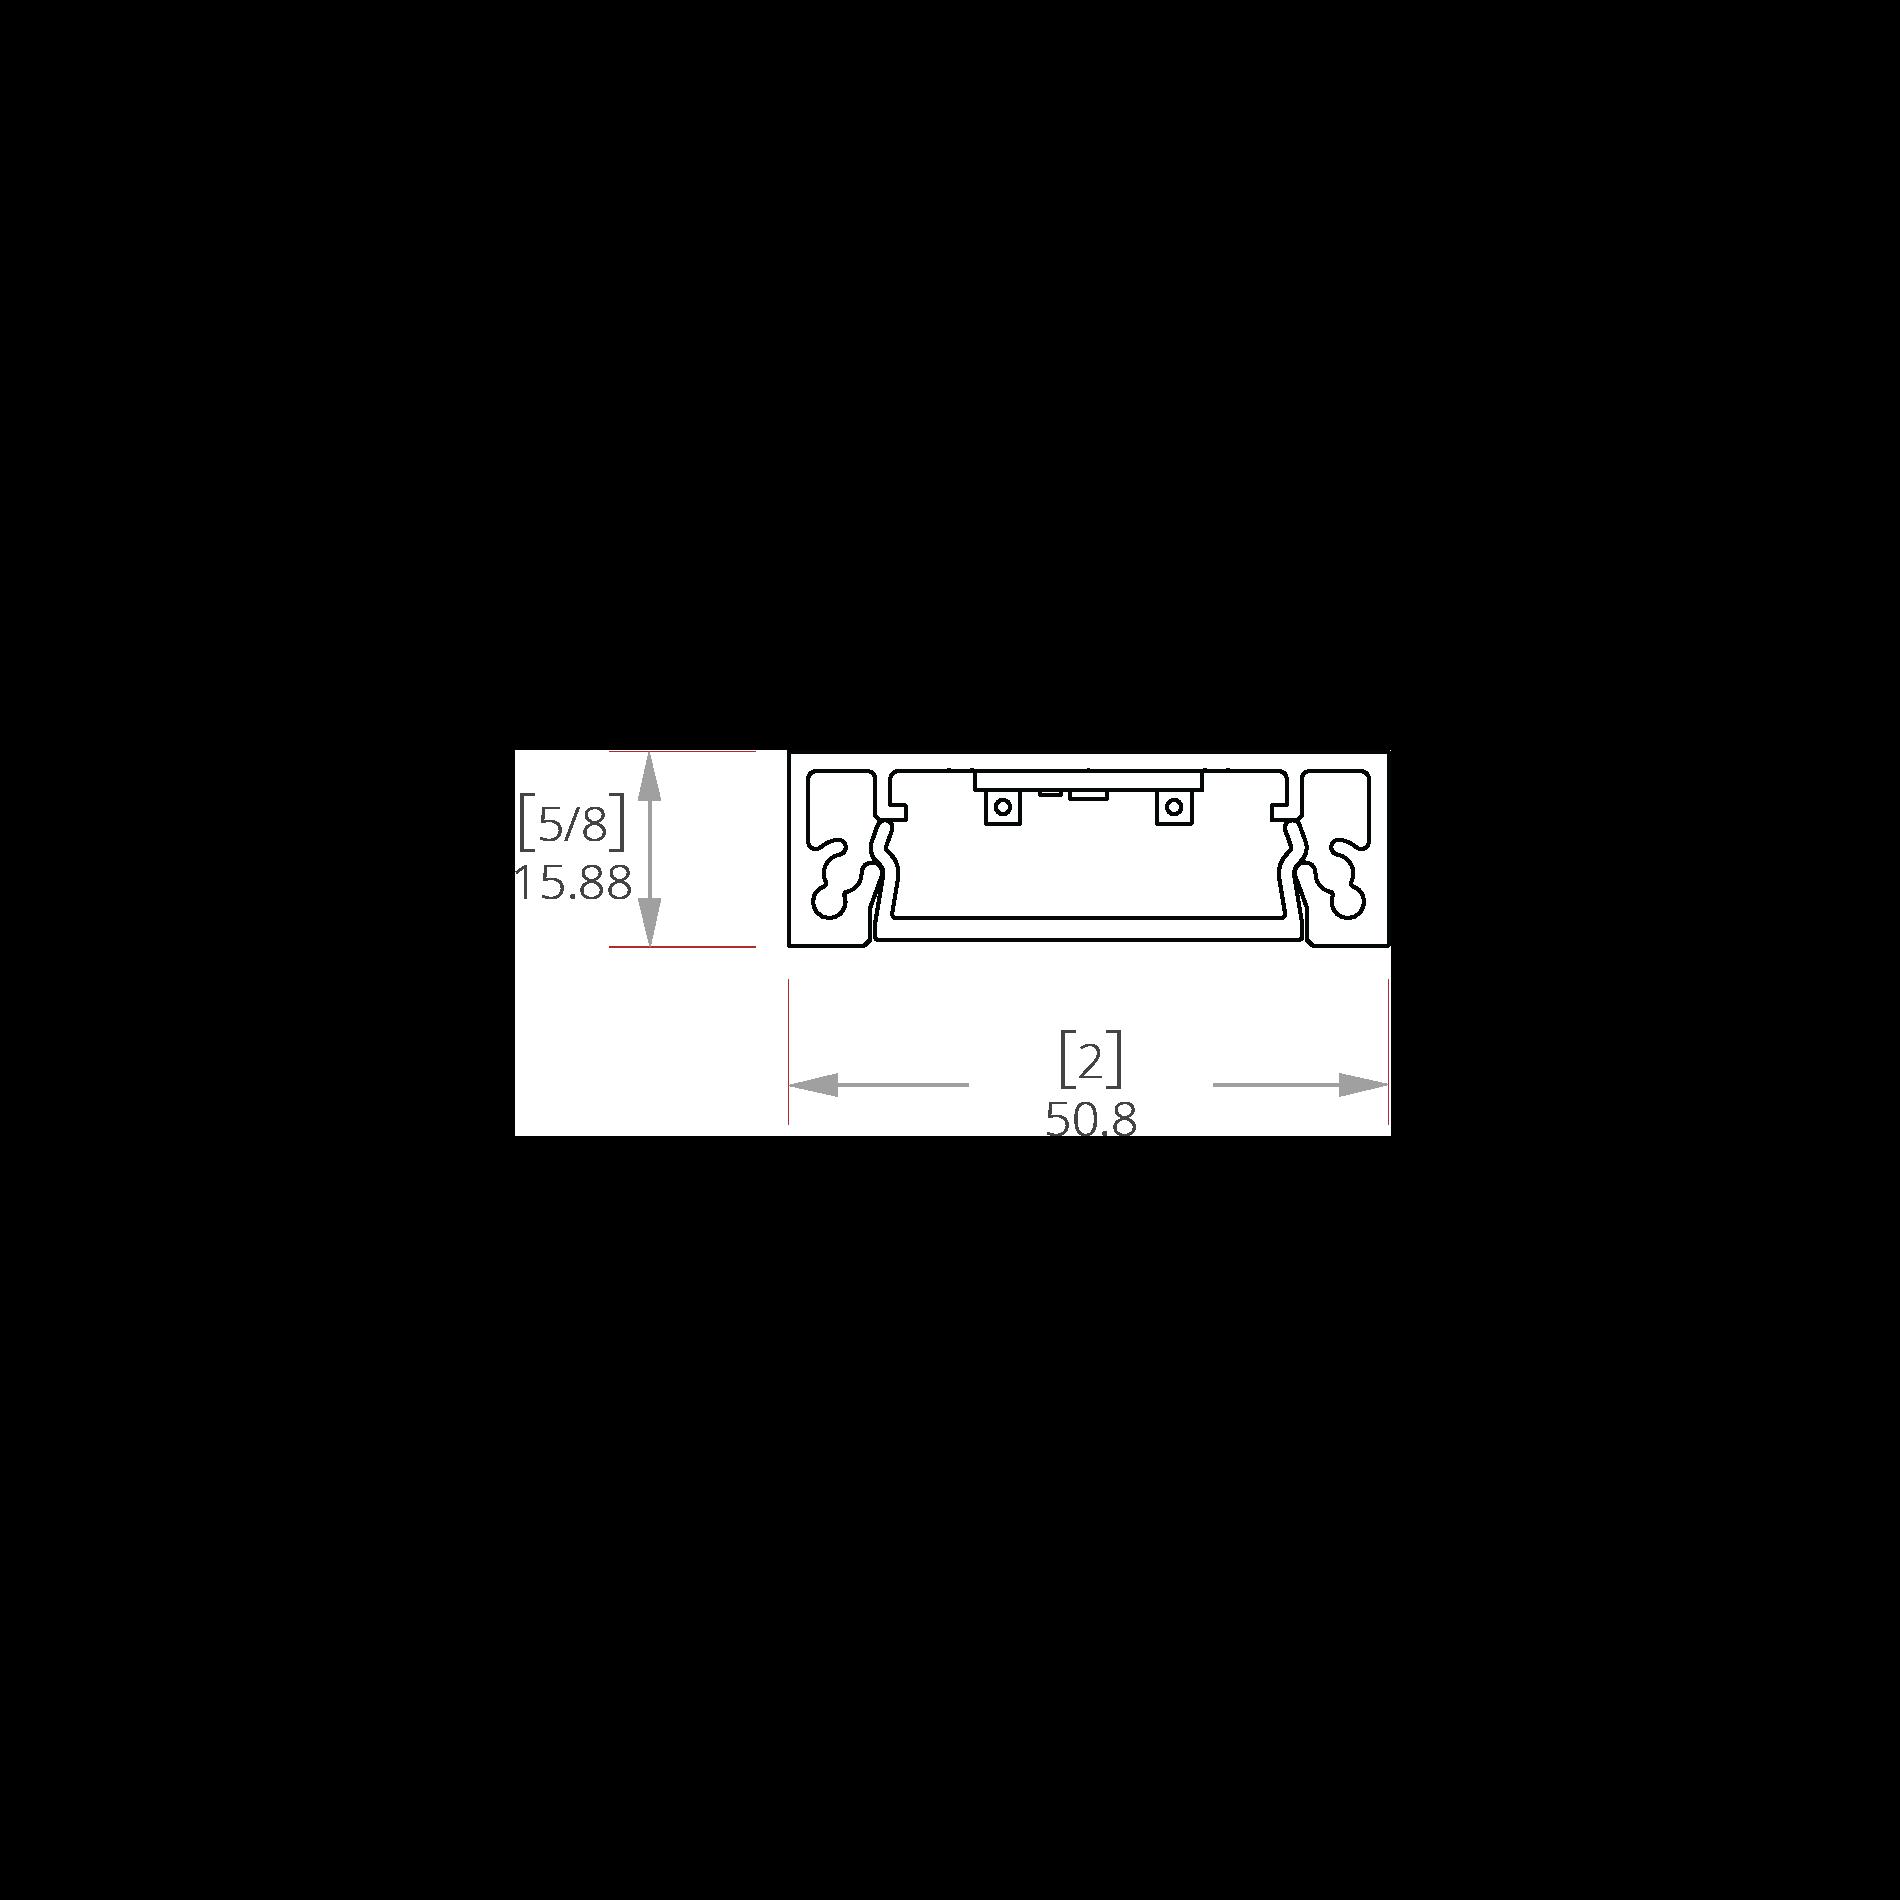 Proton 1 Line Drawing